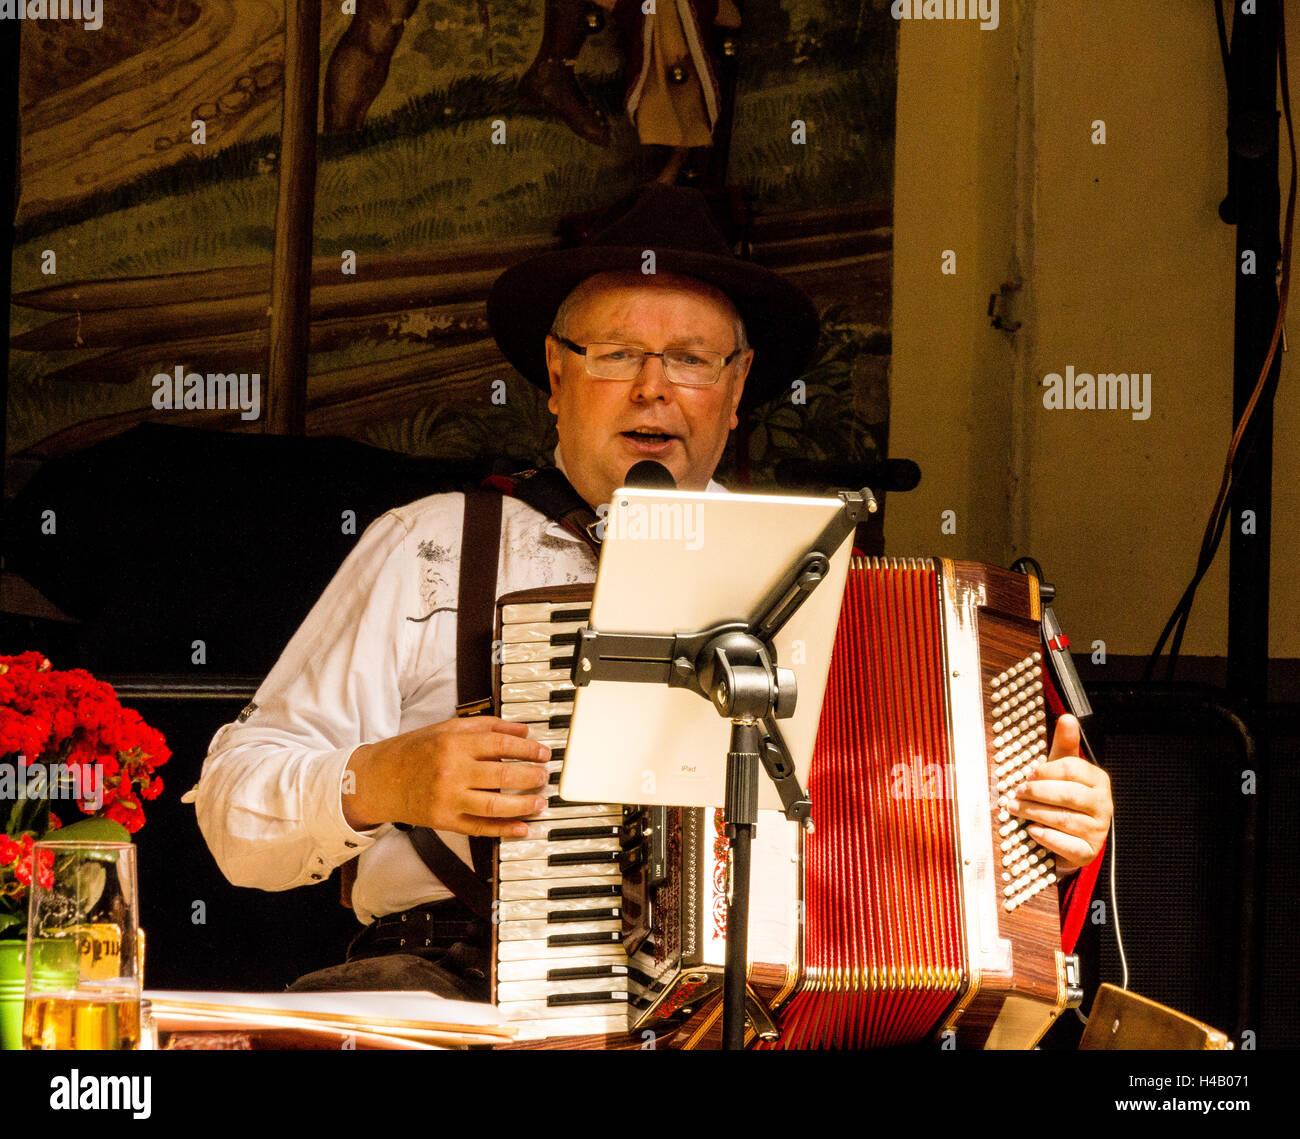 Accordion player wearing traditional Bavarian  costume, Rudesheim, Rhine Gorge, Germany, Europe - Stock Image